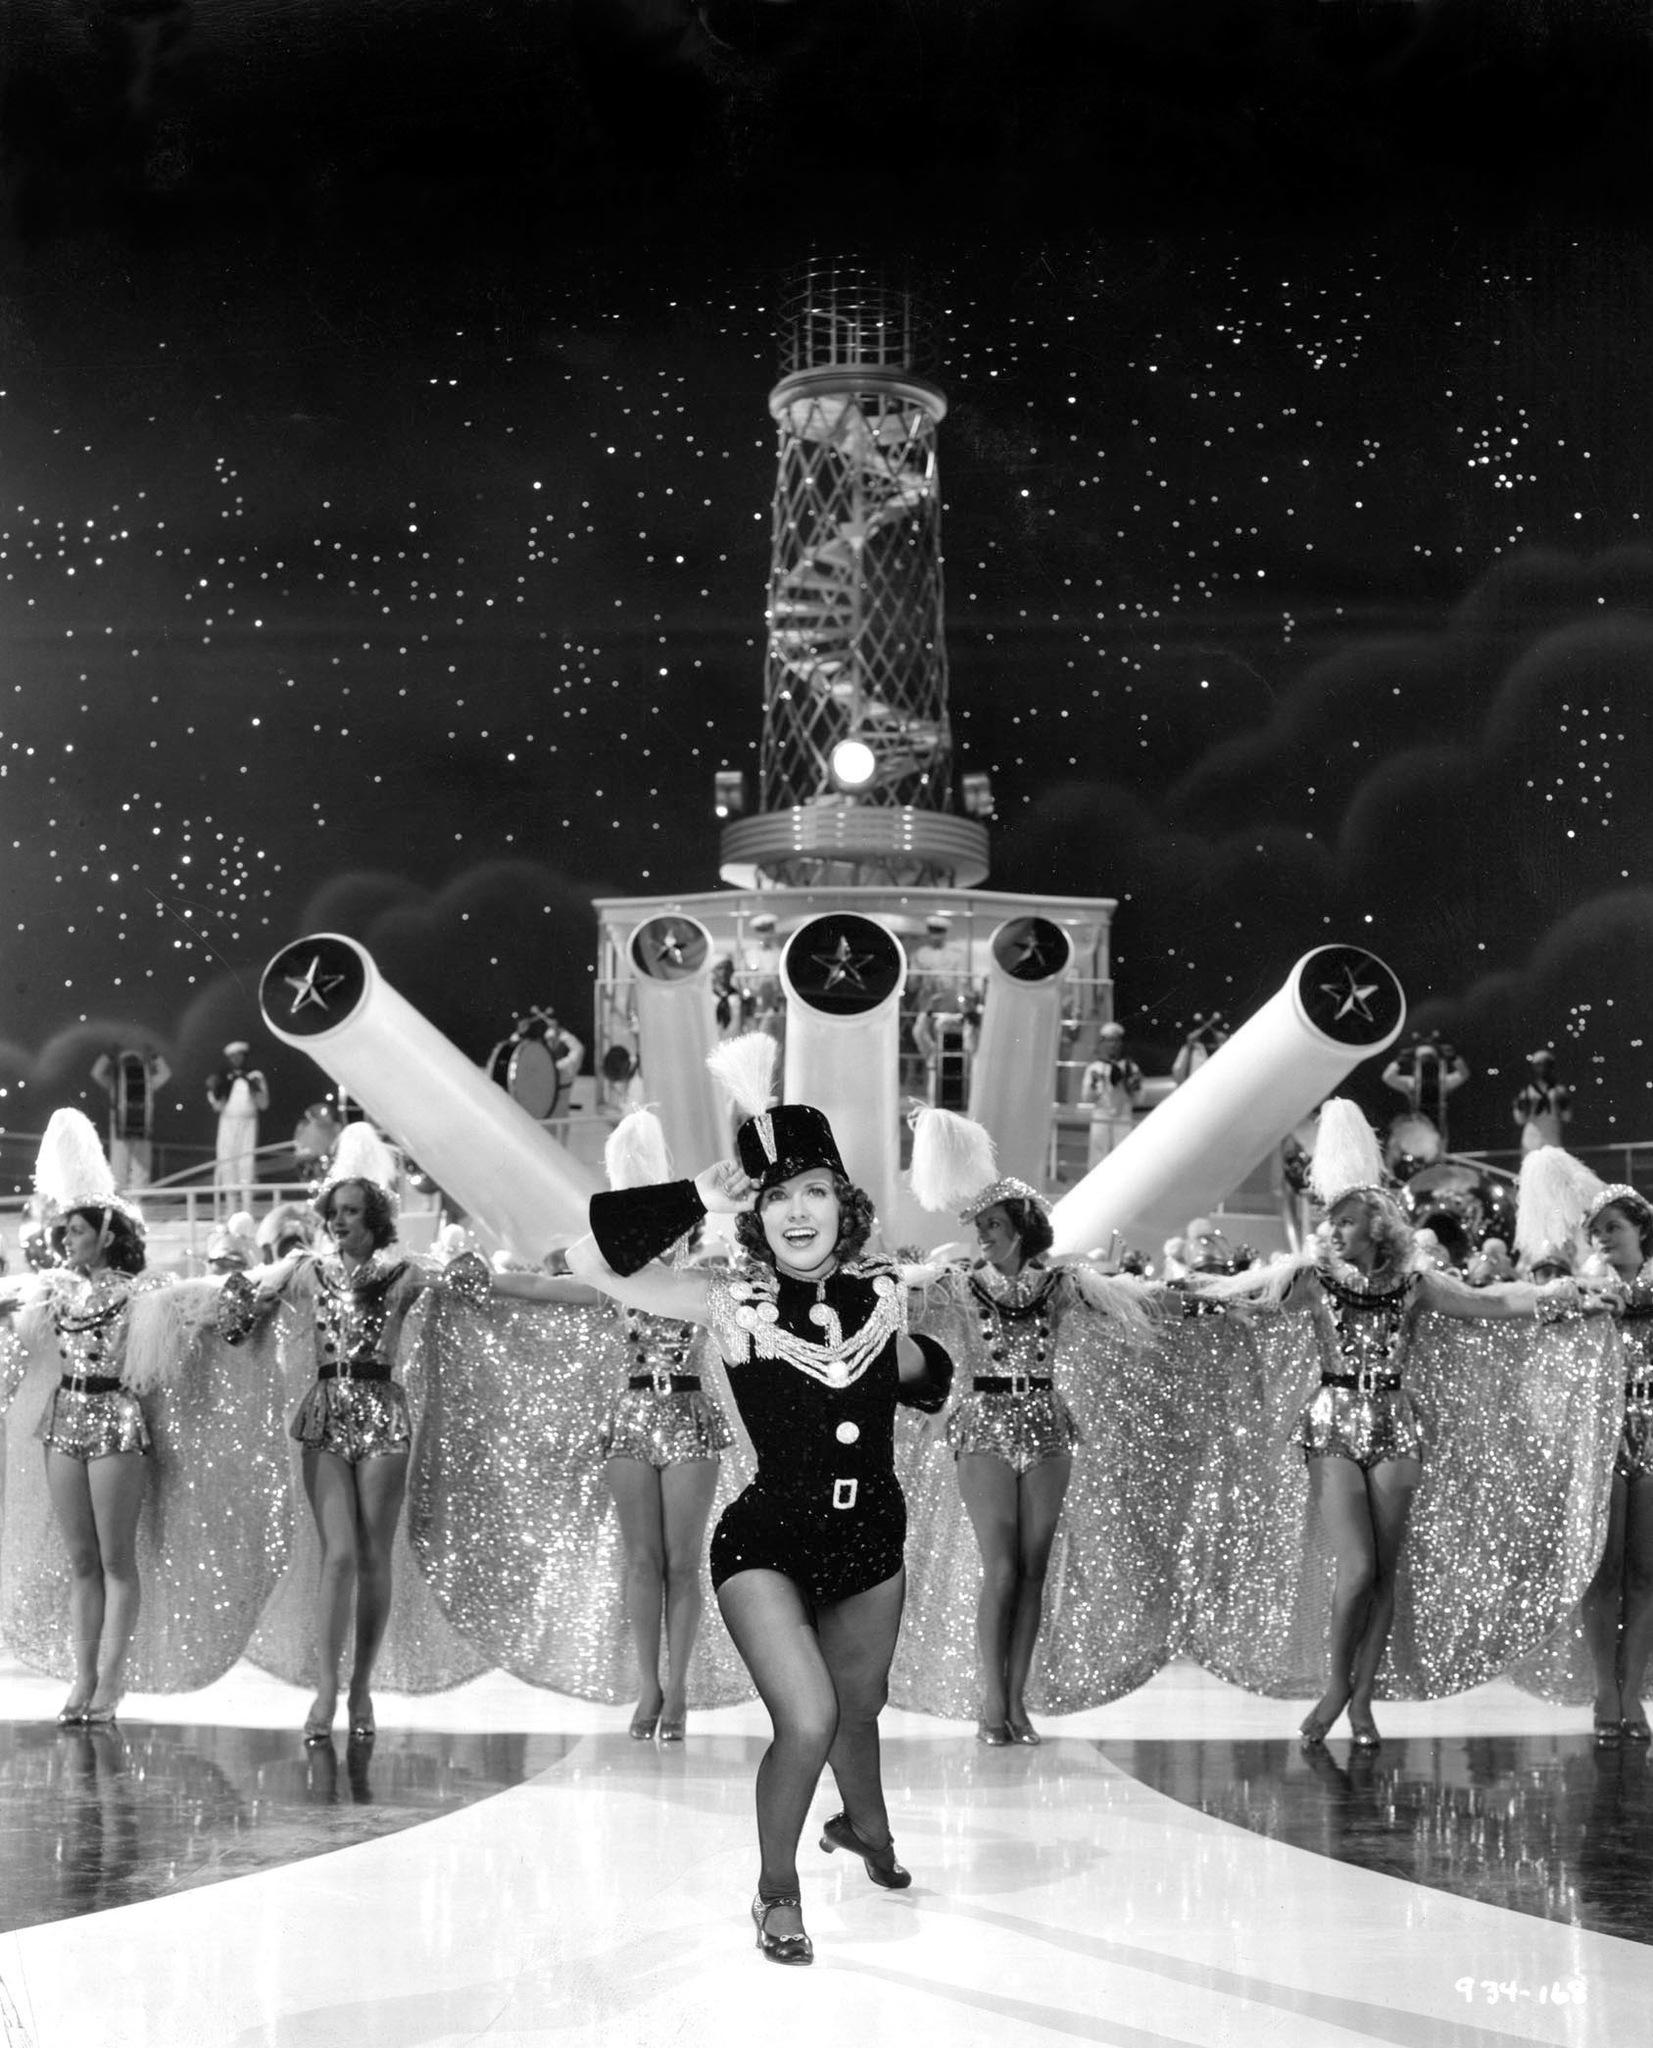 Eleanor Powell, Midgie Dare, Doris Davenport, Mary Dees, Edna Mae Jones, Vivian Faulkner, and Wilma Holly in Born to Dance (1936)